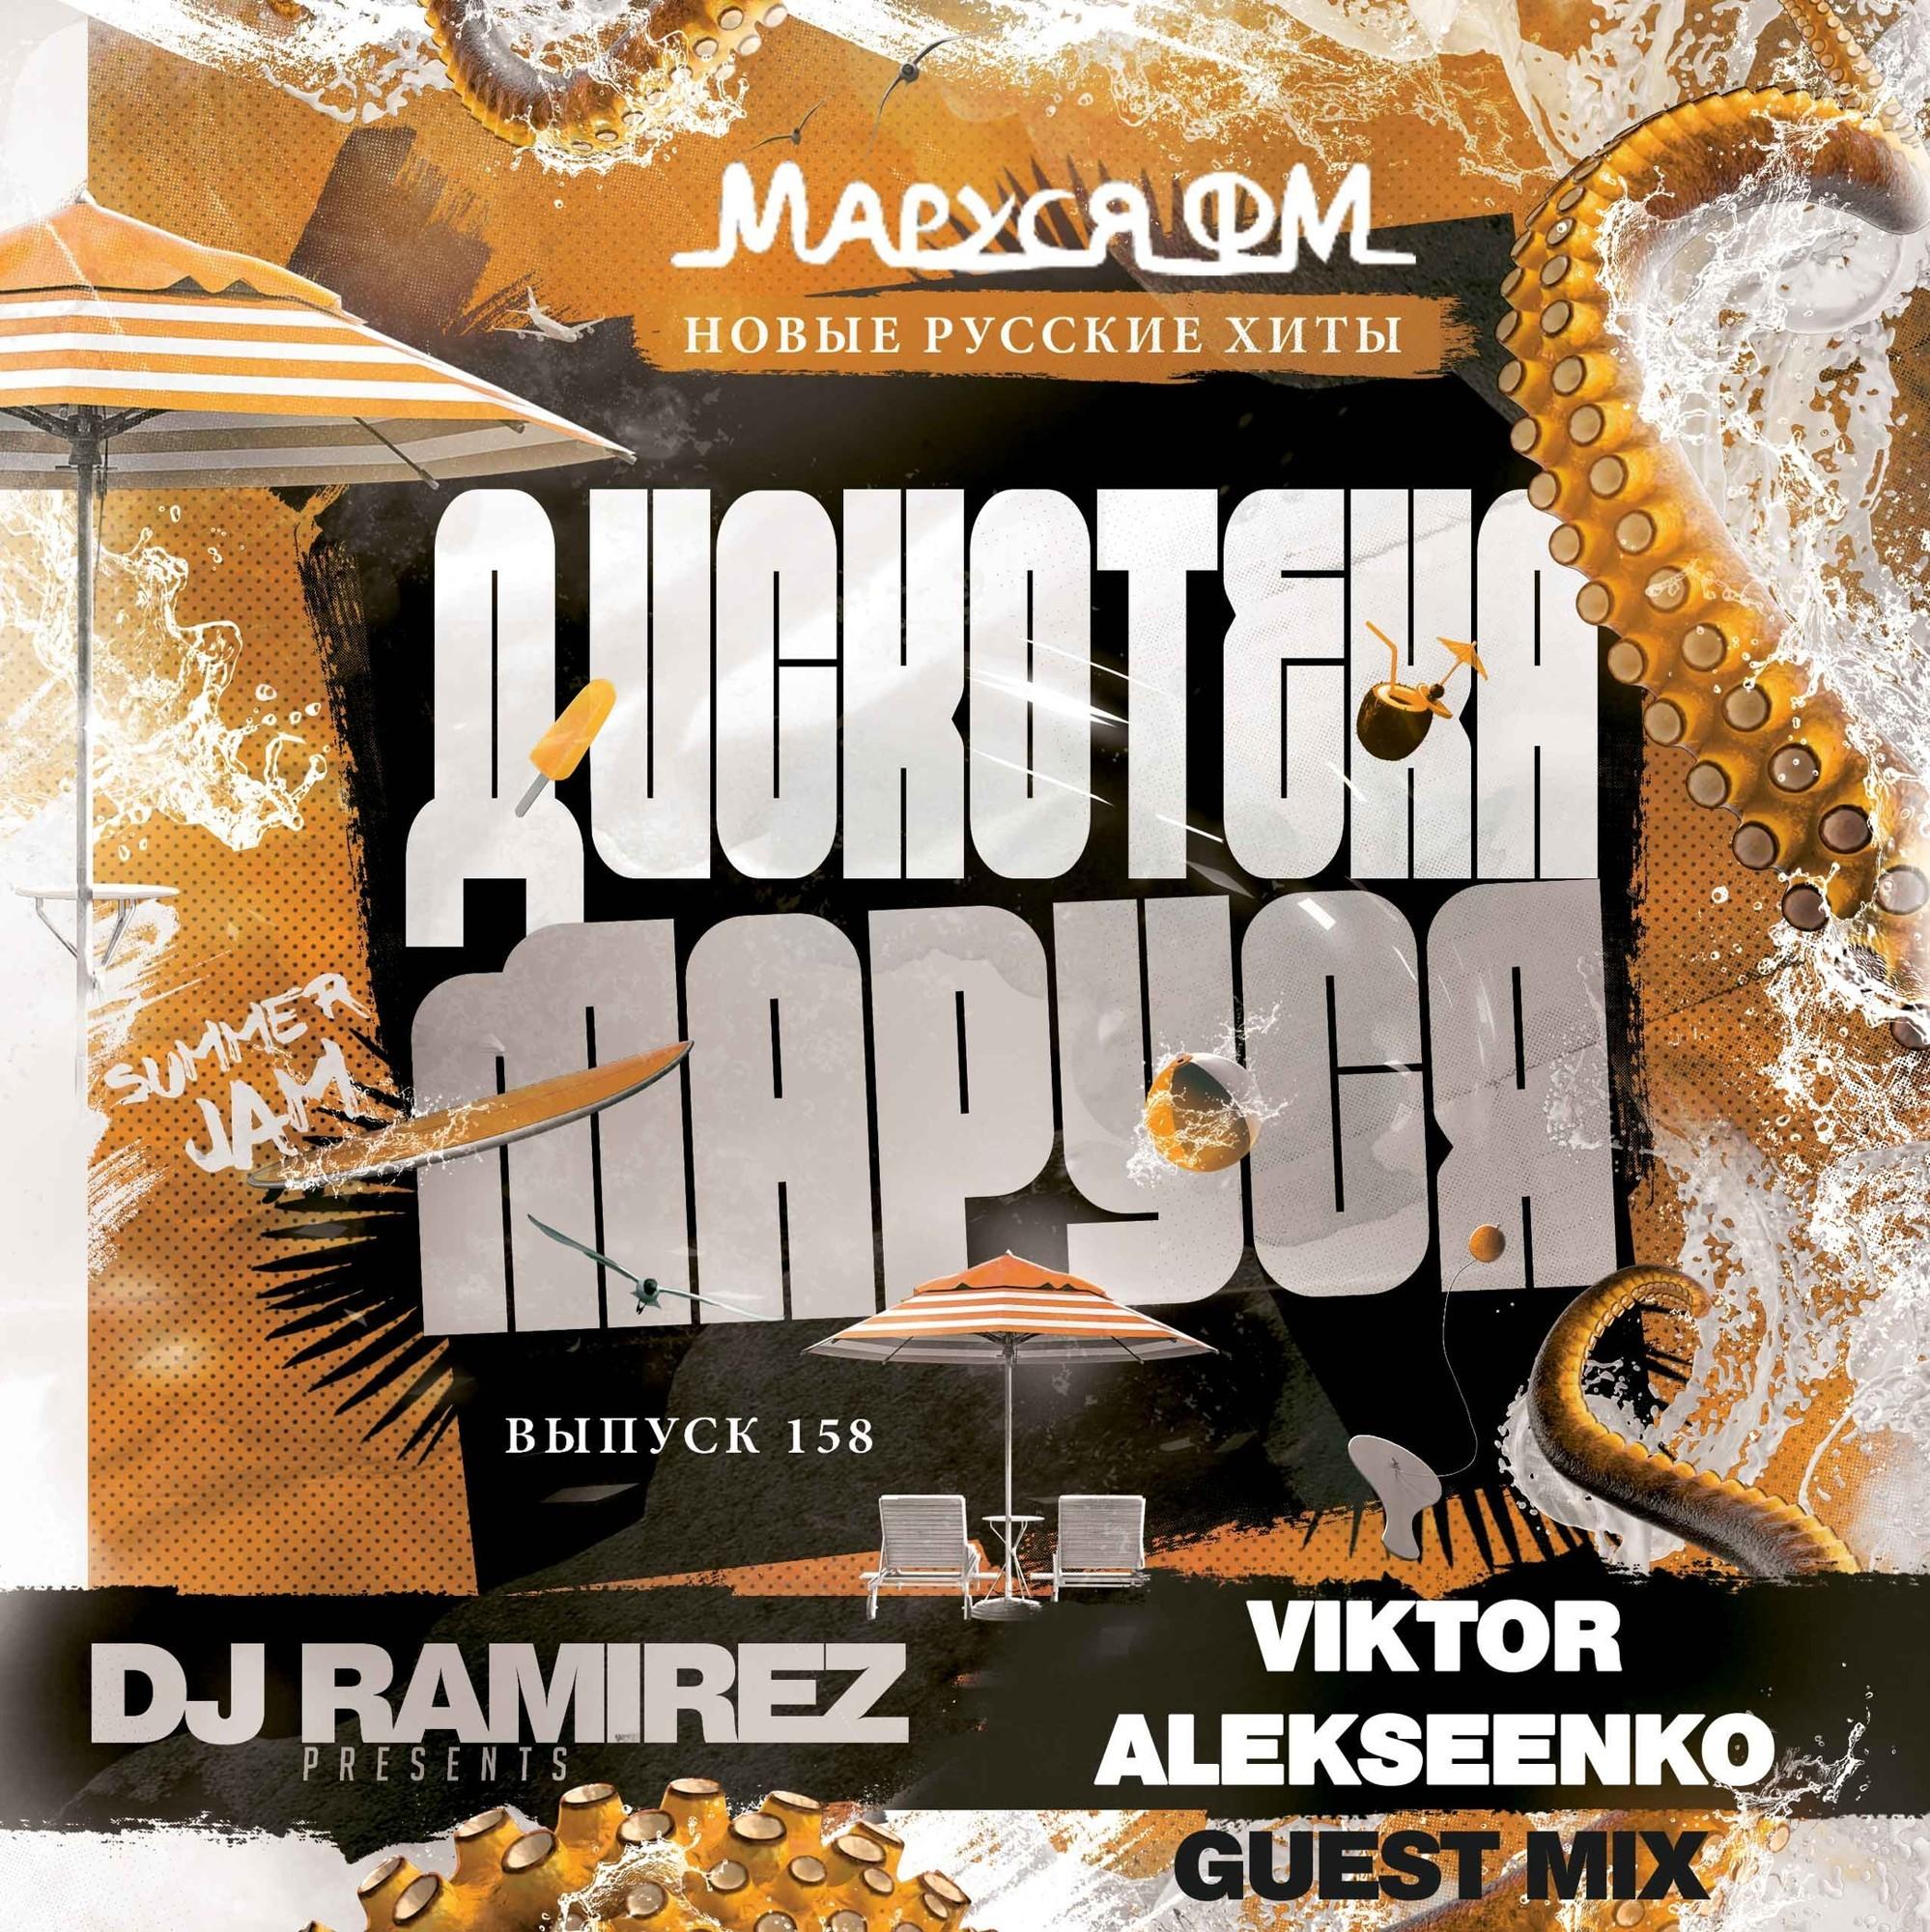 Viktor Alekseenko - Special Guest Mix For Дискотека Маруся #158